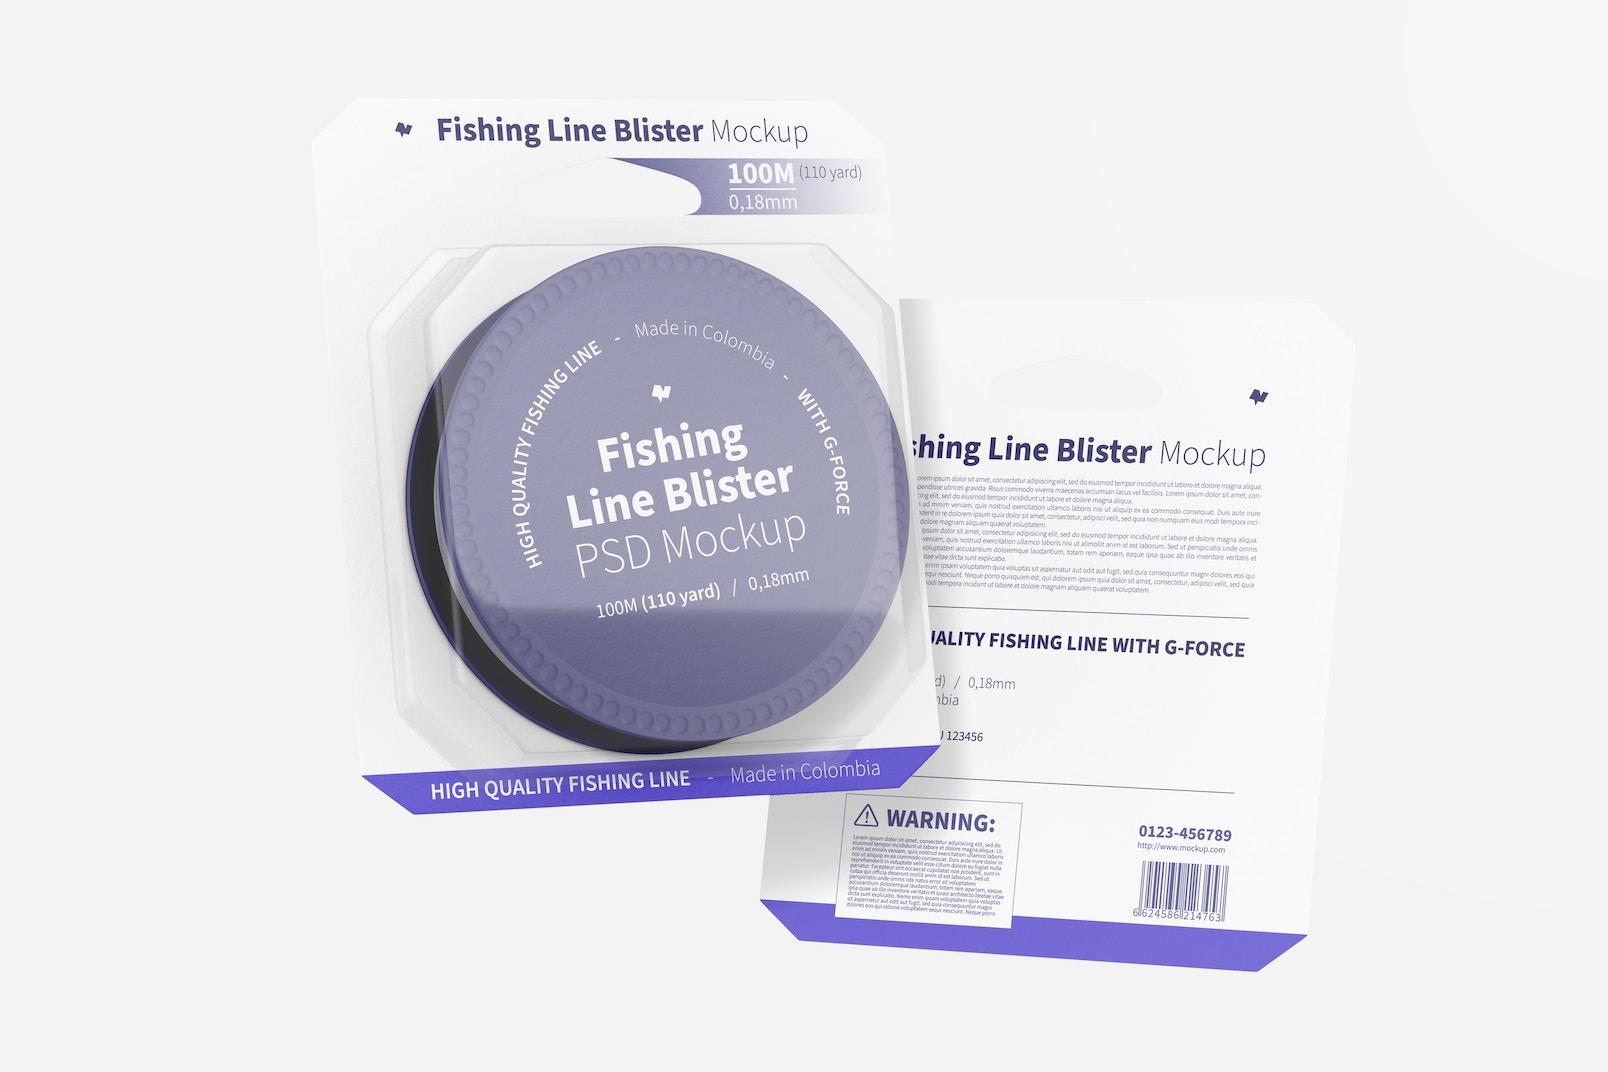 Fishing Line Blisters Mockup, Floating